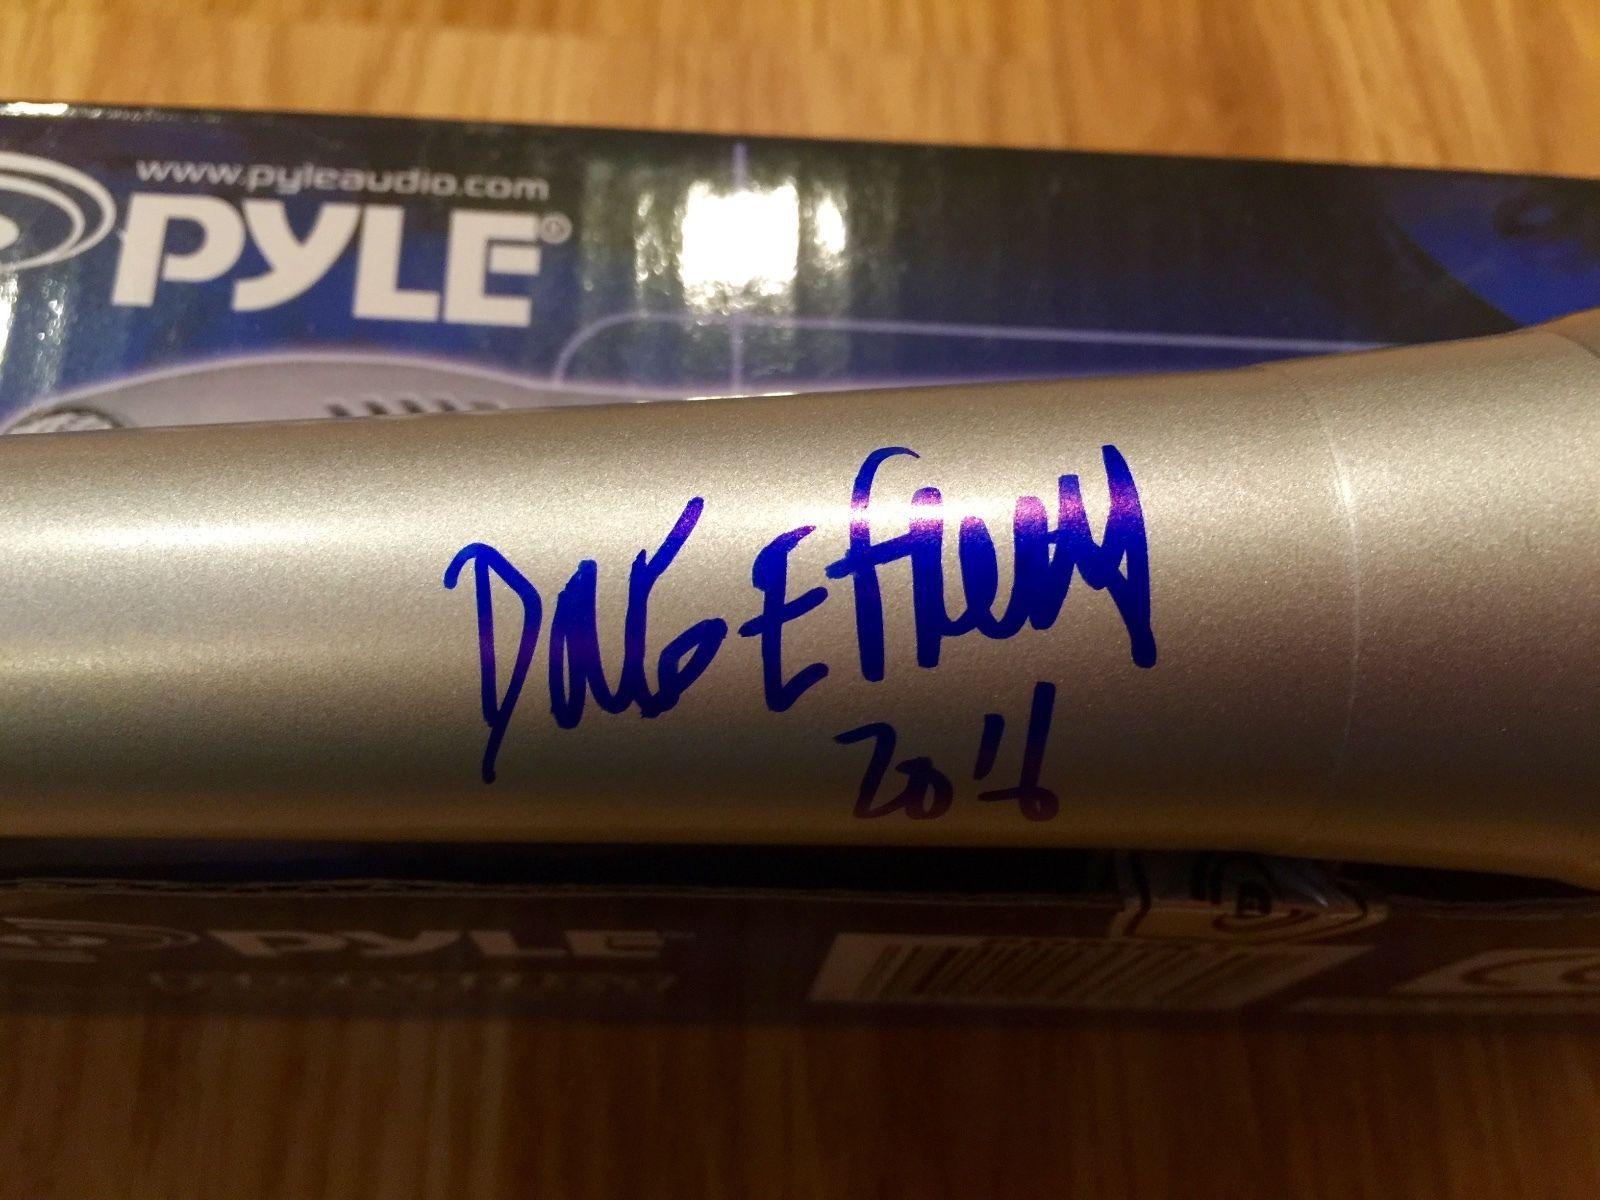 Doug E. Fresh Legendary Hip-Hop Artist Signed Microphone Photo Proof SNOOP DOGG